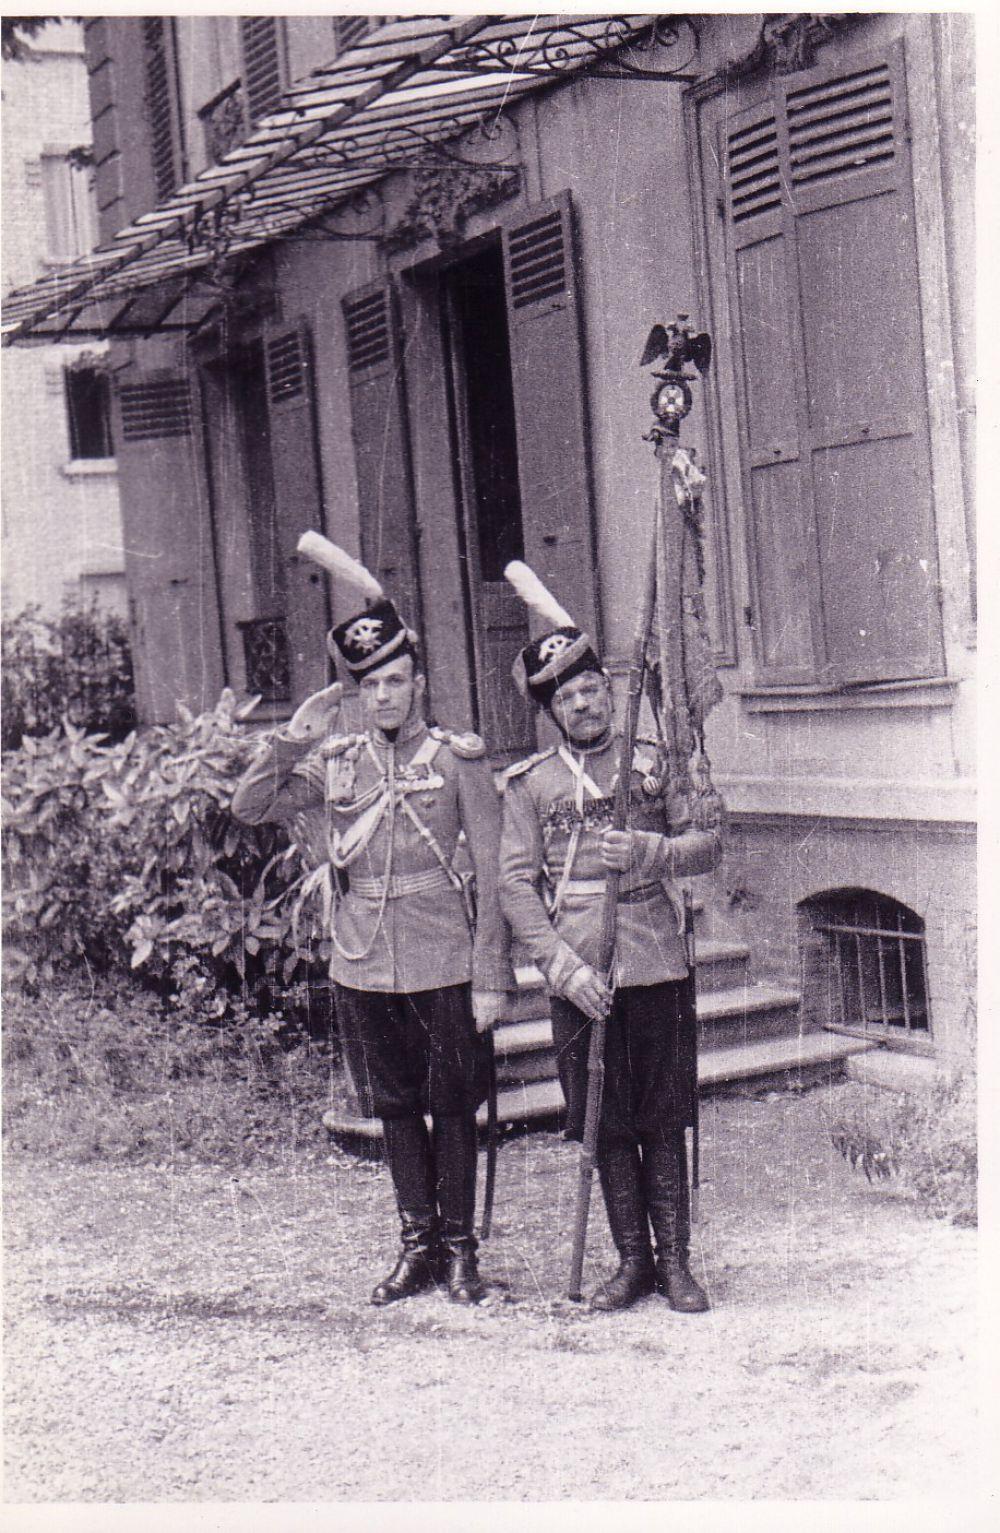 Подъесаул Кундрюков и вахмистр Бодрухин во дворе музея Лейб-казаков в Курбевуа (Франция), 1930-е годы.